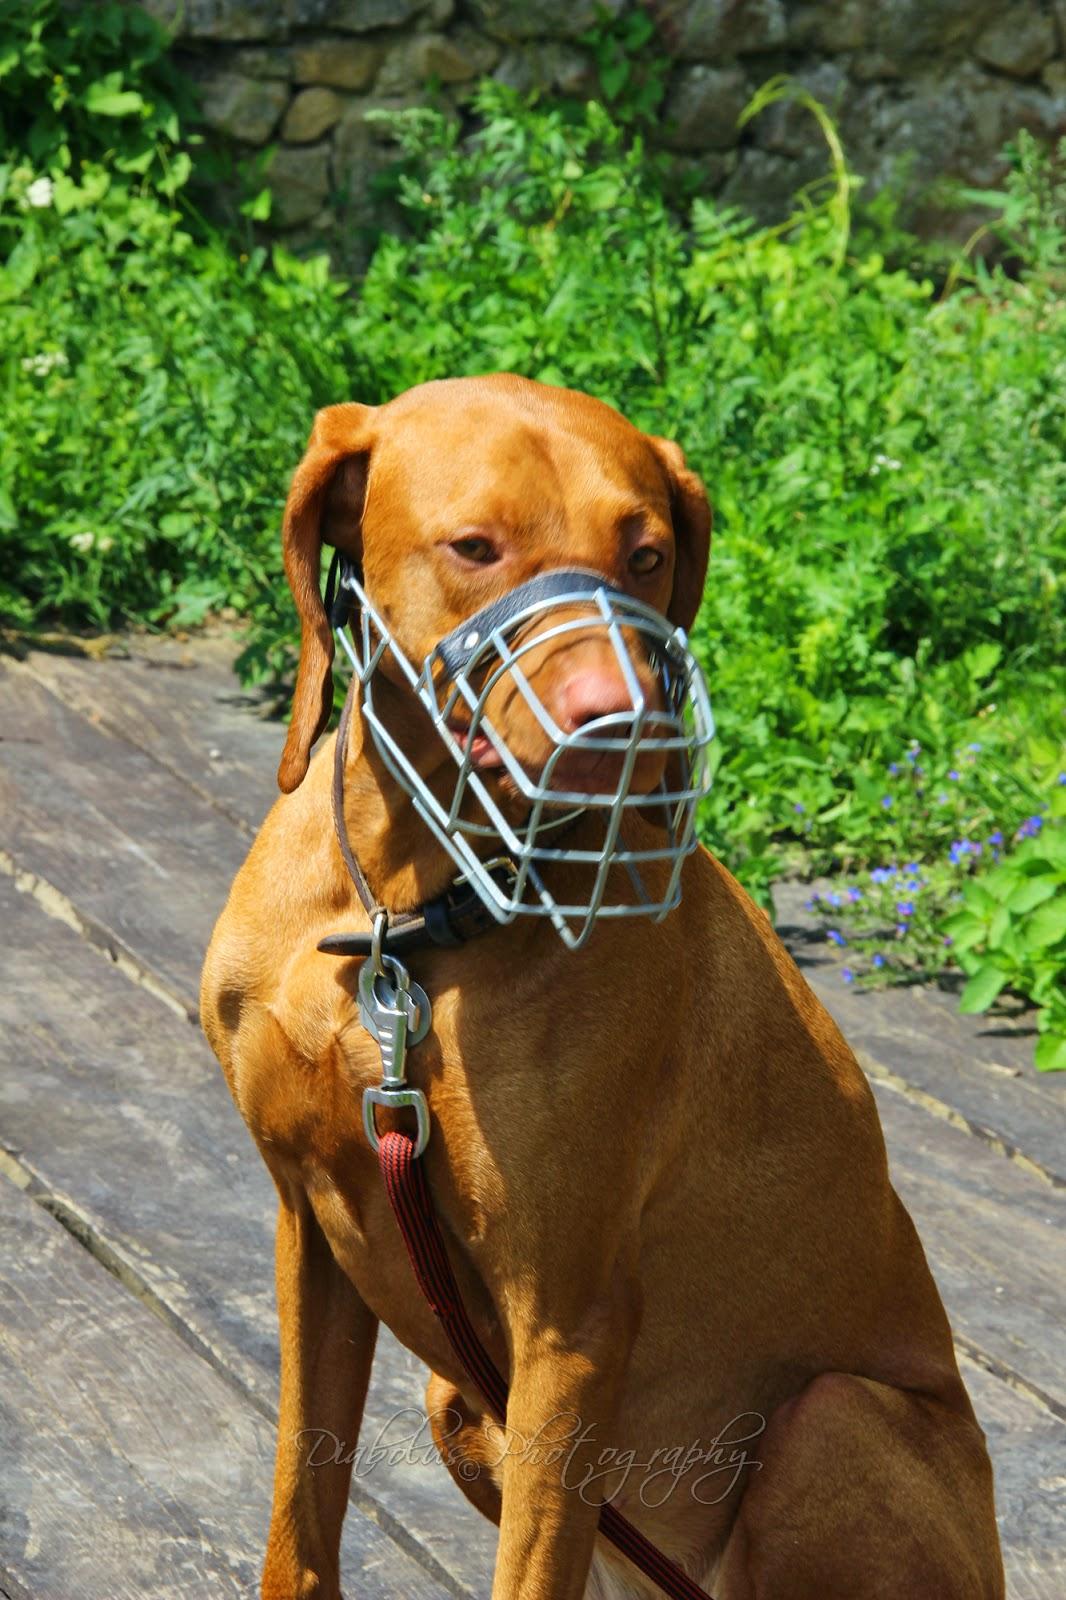 Baily/Baily the Dog